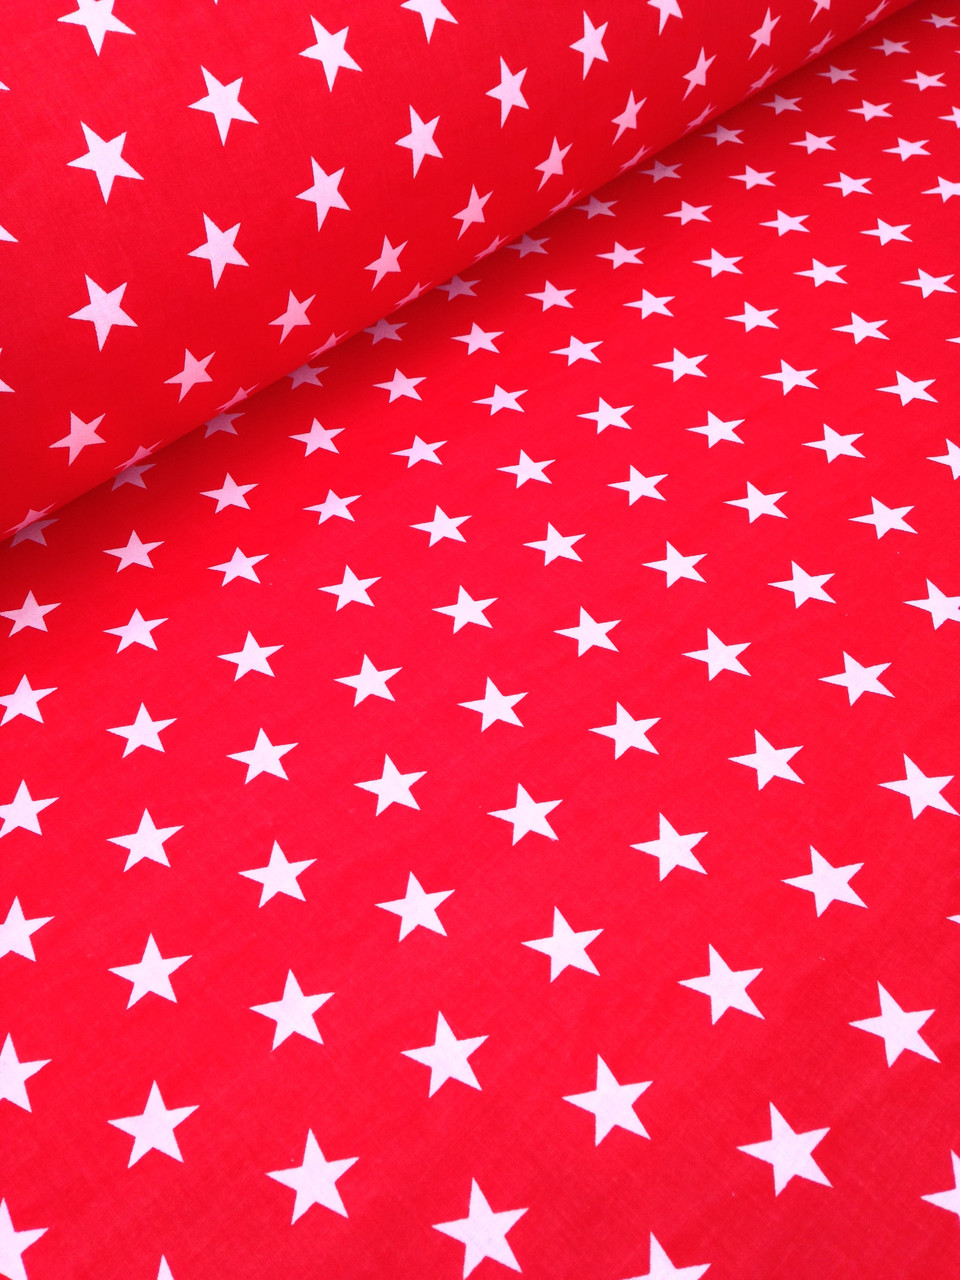 Хлопковая ткань польская белые звезды на красном частые